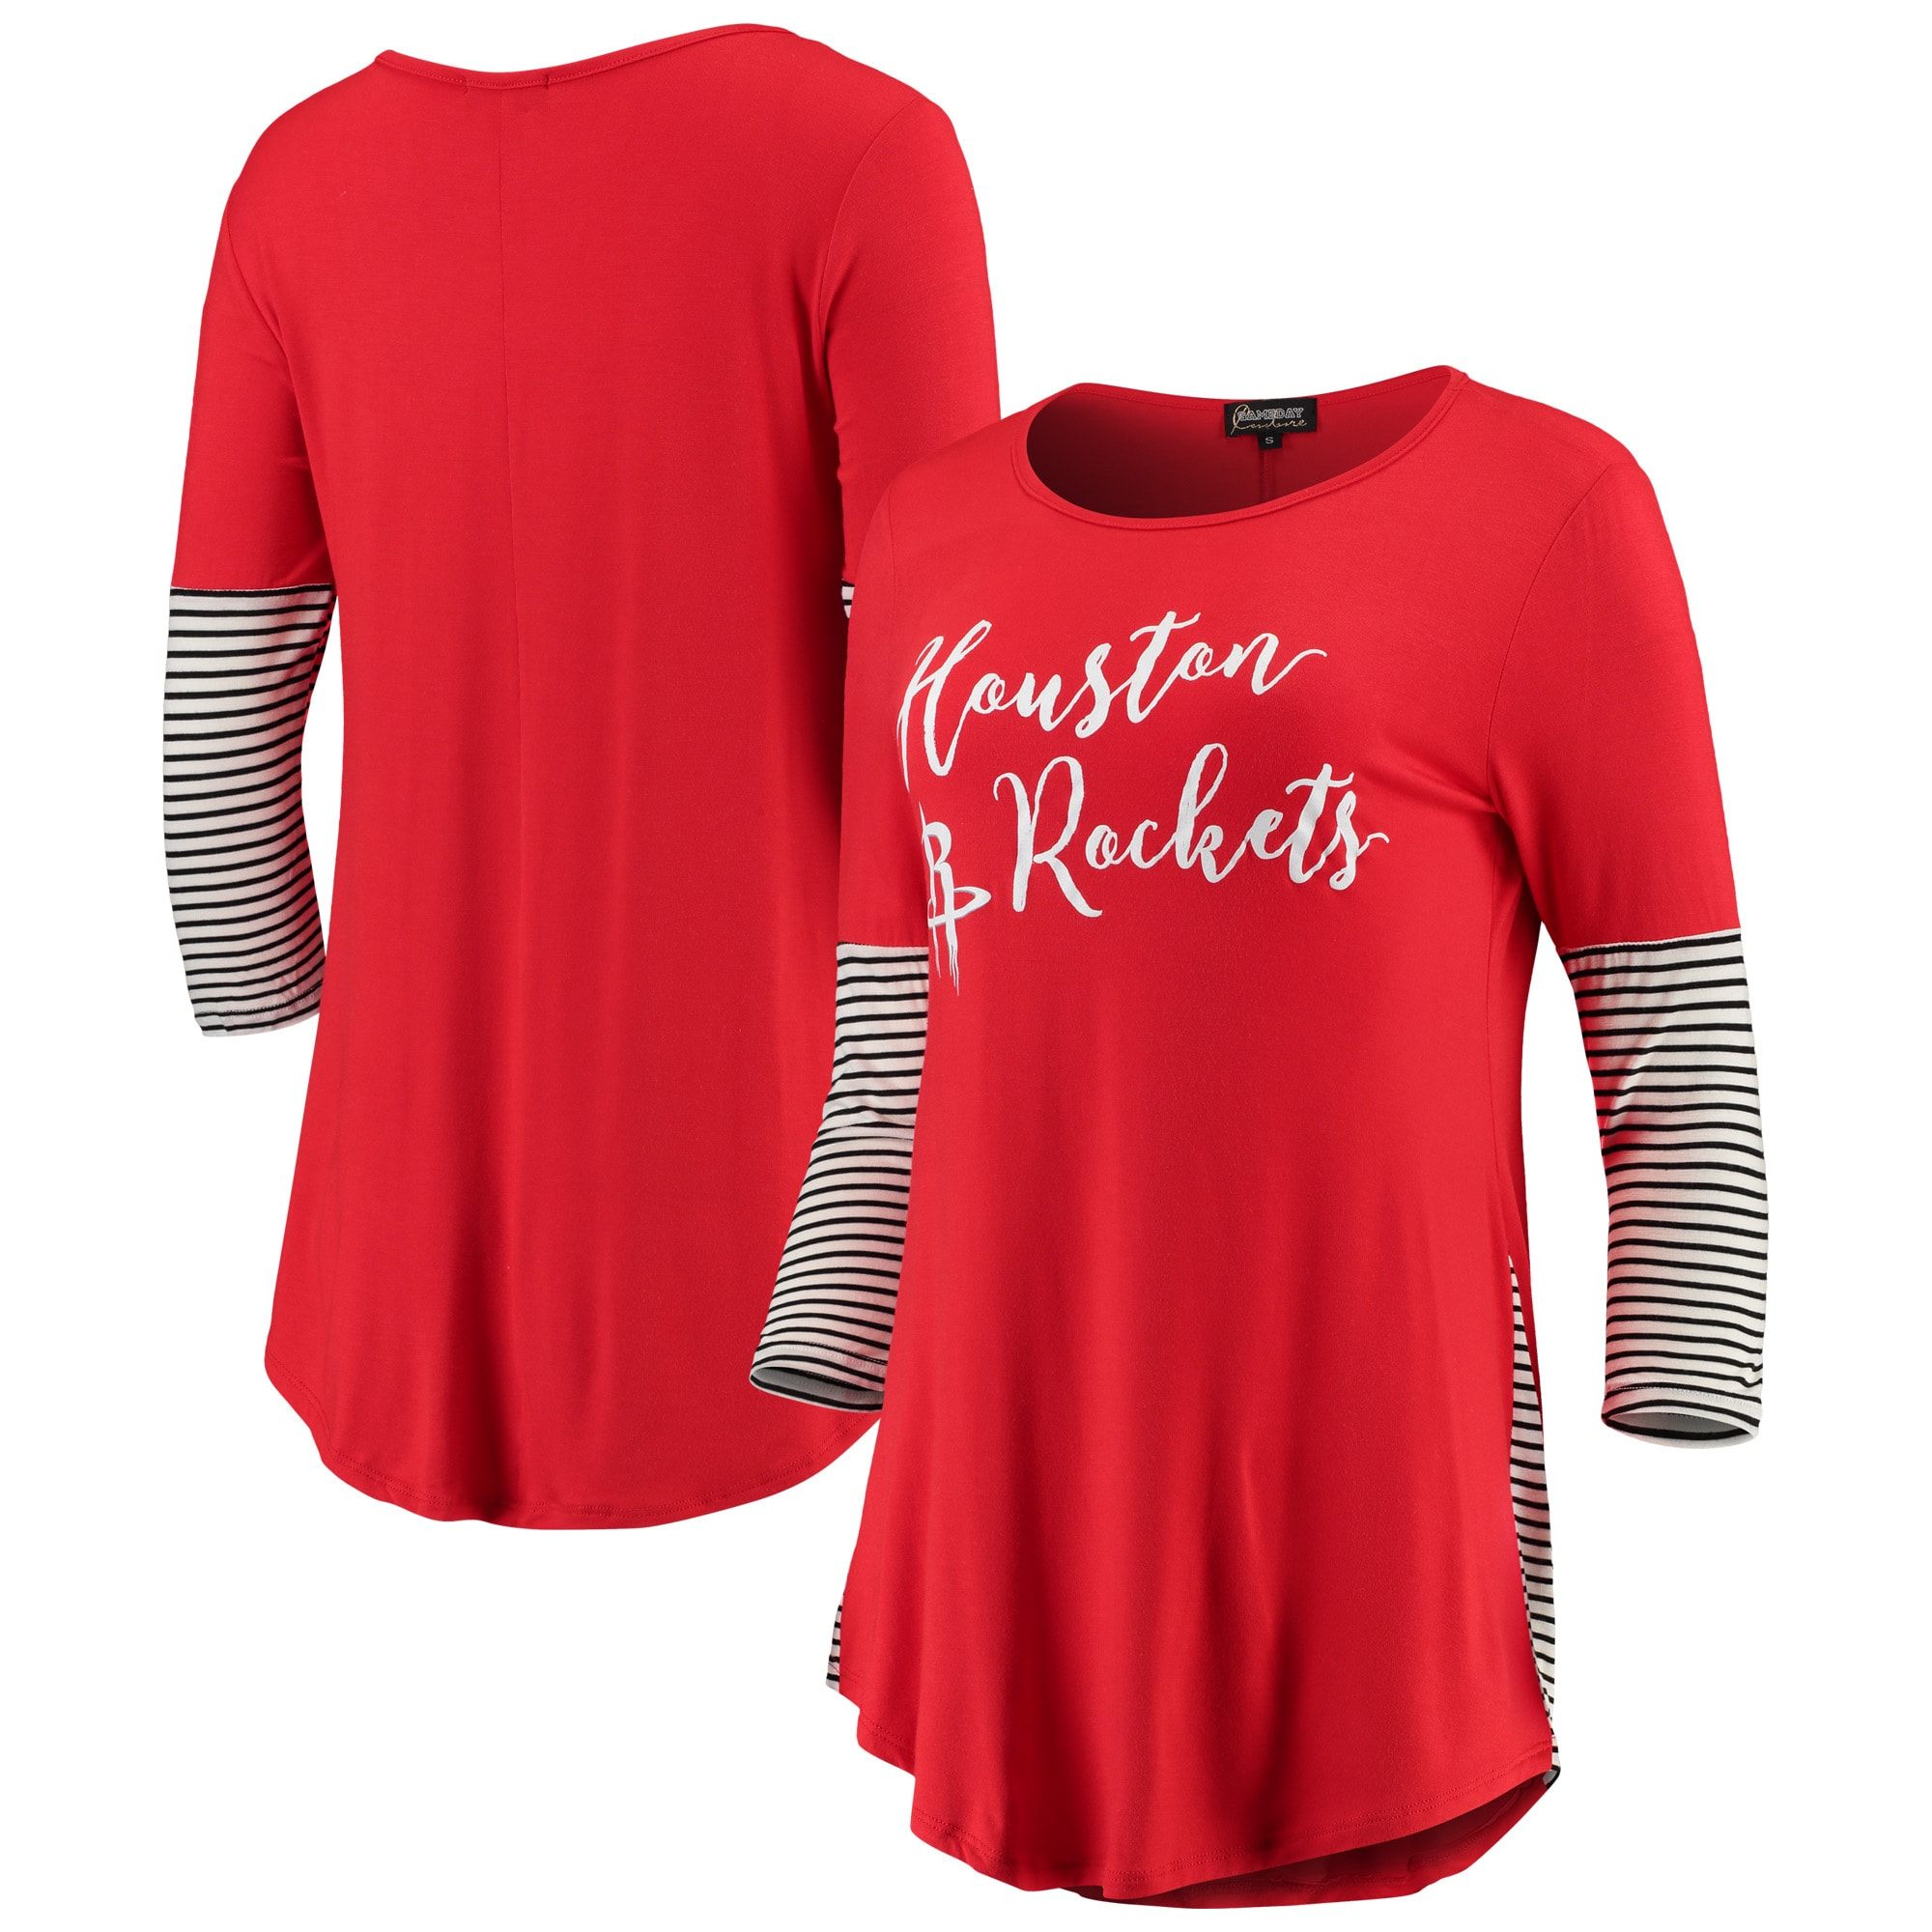 Houston Rockets Women's Striking in Stripes 3/4 Sleeve Tunic T-Shirt - Red